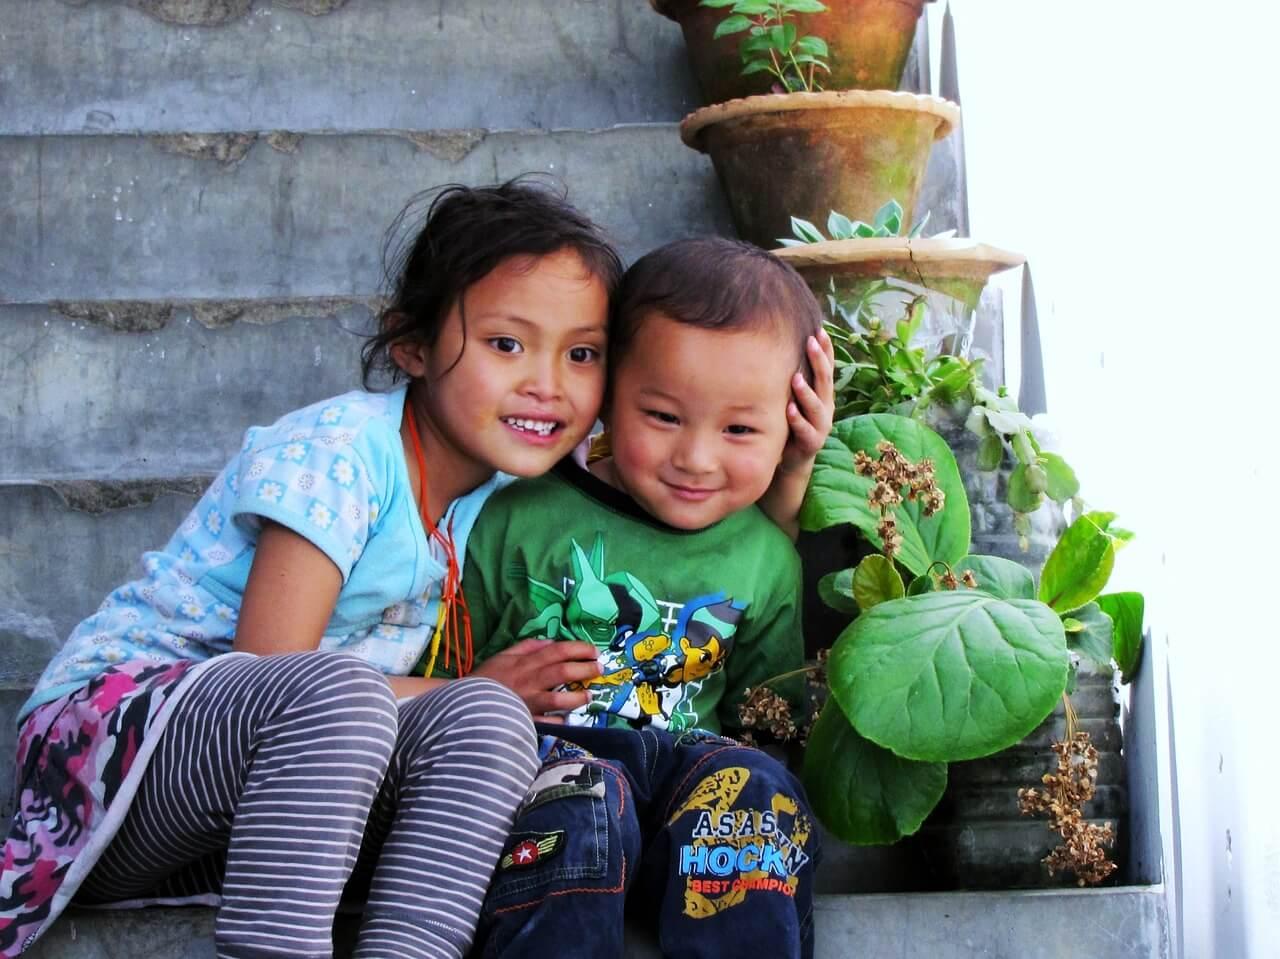 bhutan-happiness-index